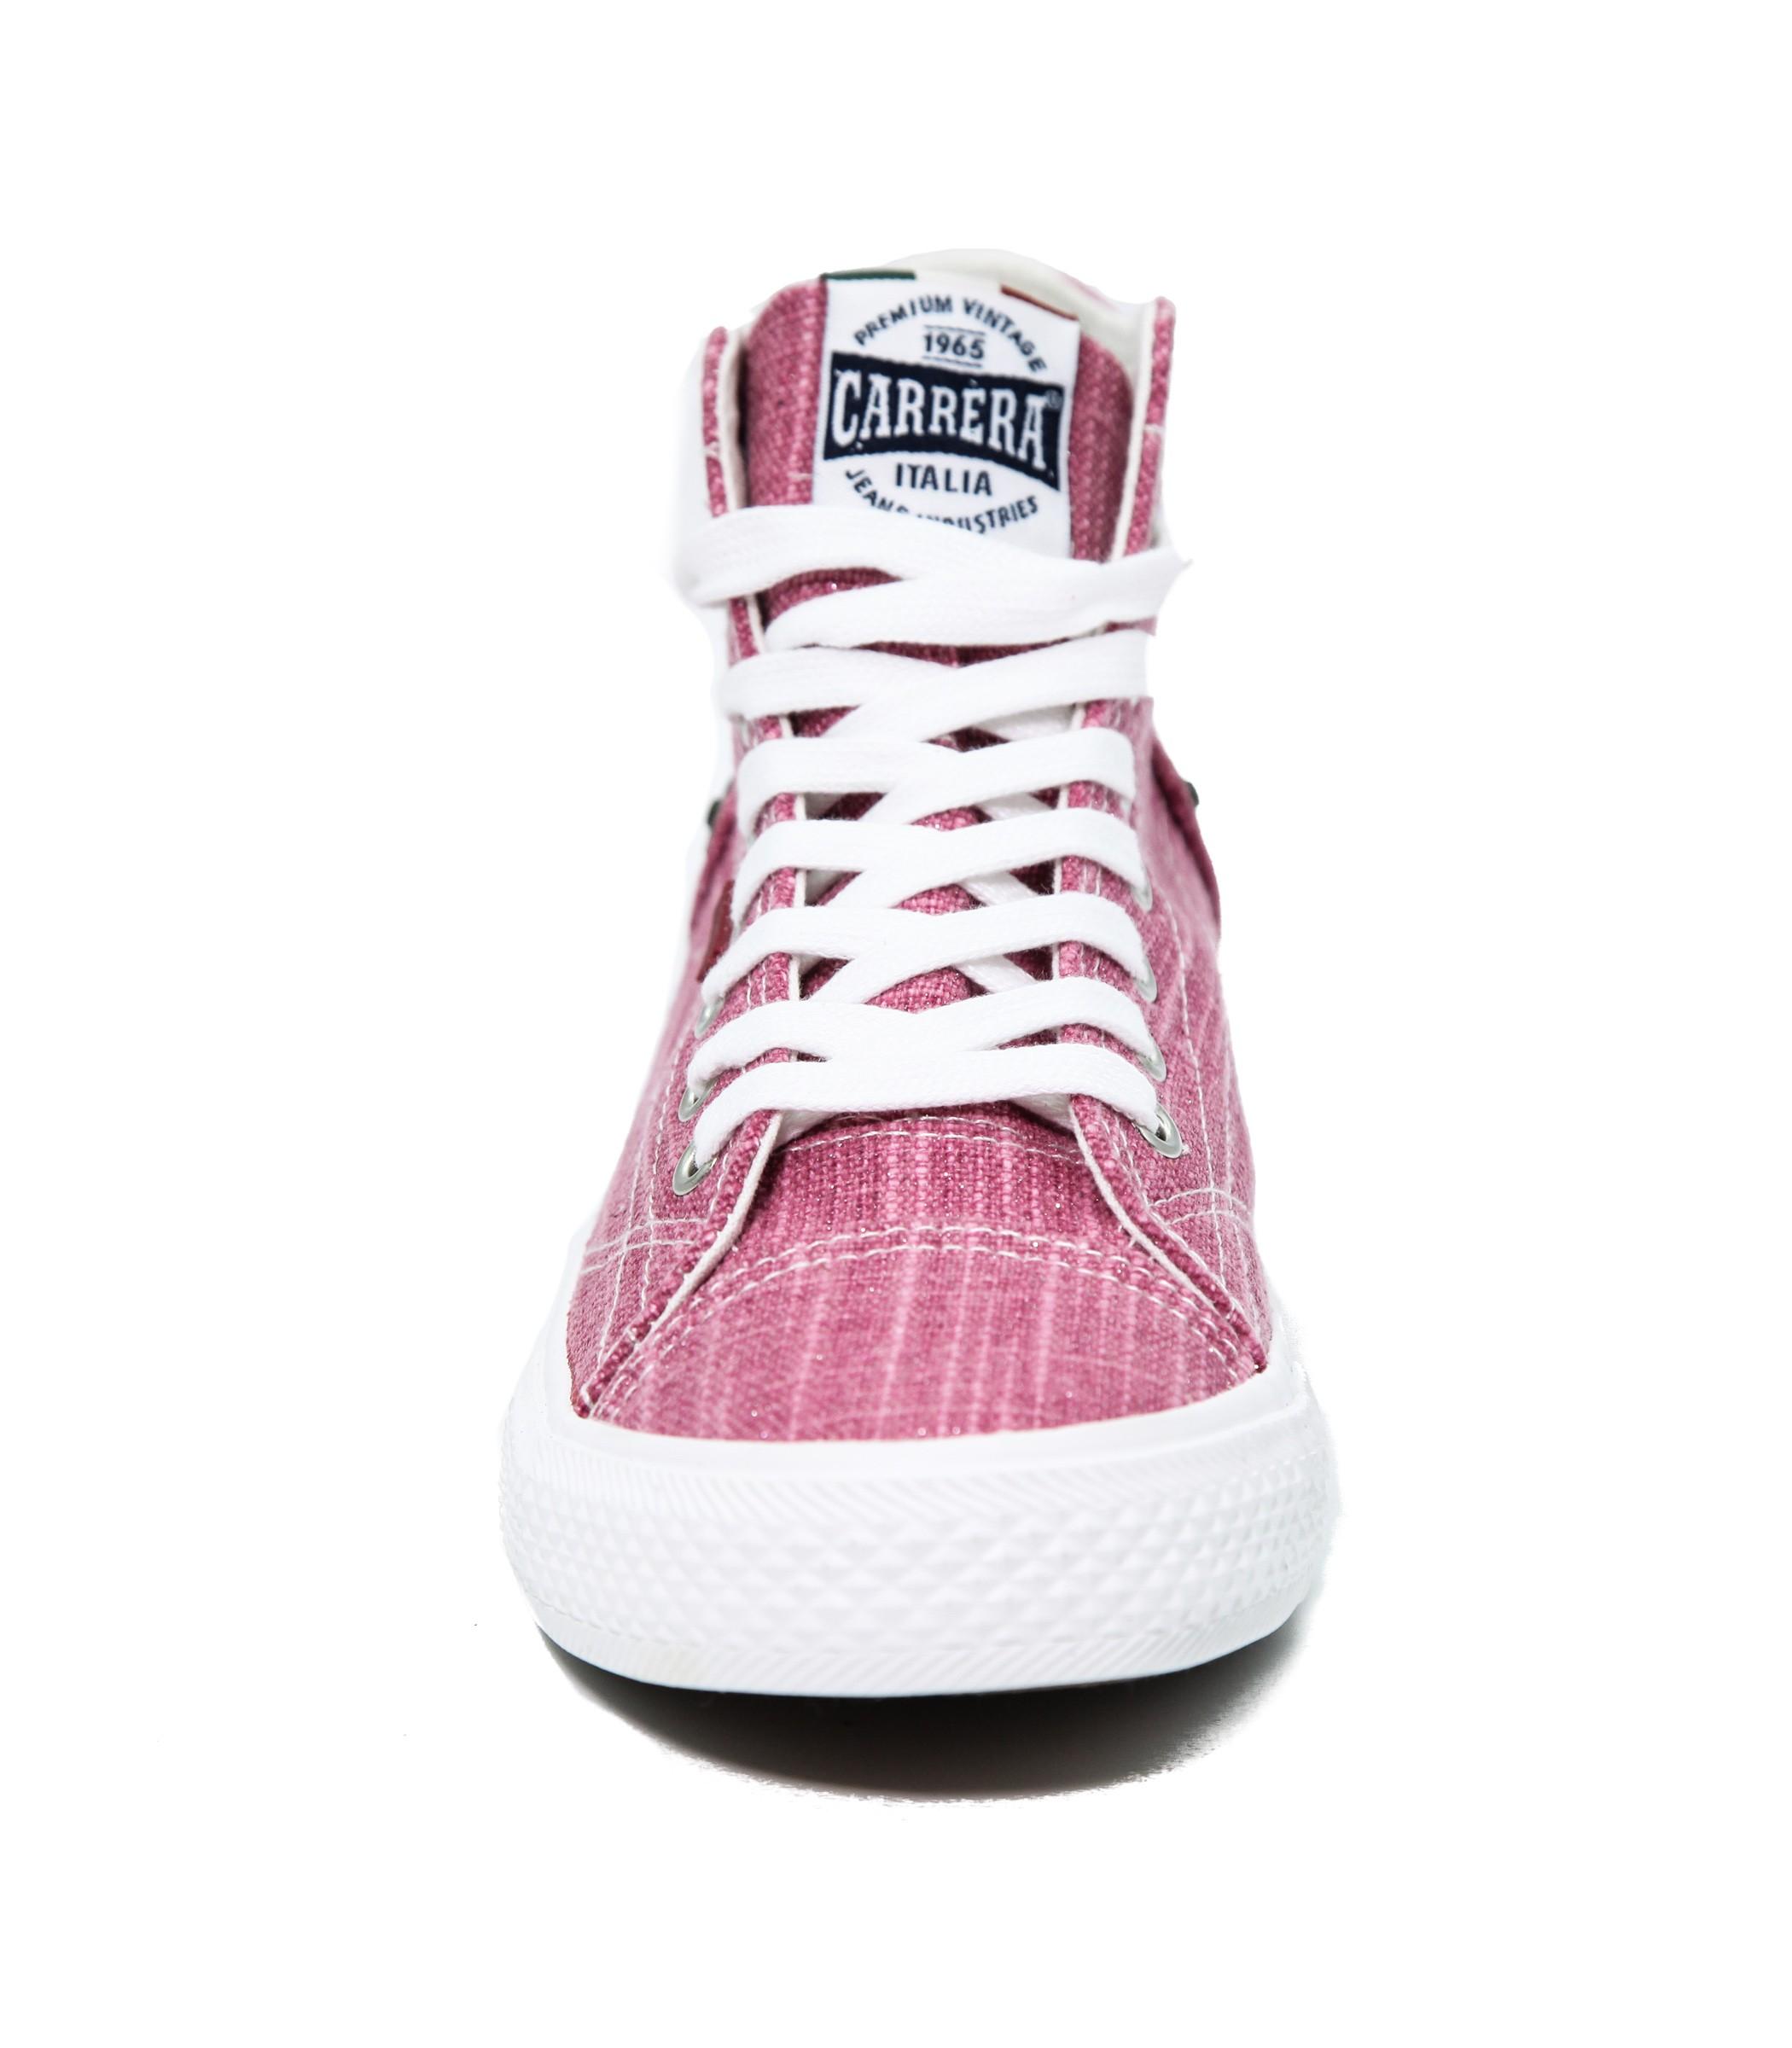 Sneakers Donna Alte Tela In Rosa Da Wyzbw Scarpe Ginnastica Carrera ptxdpqwTZ